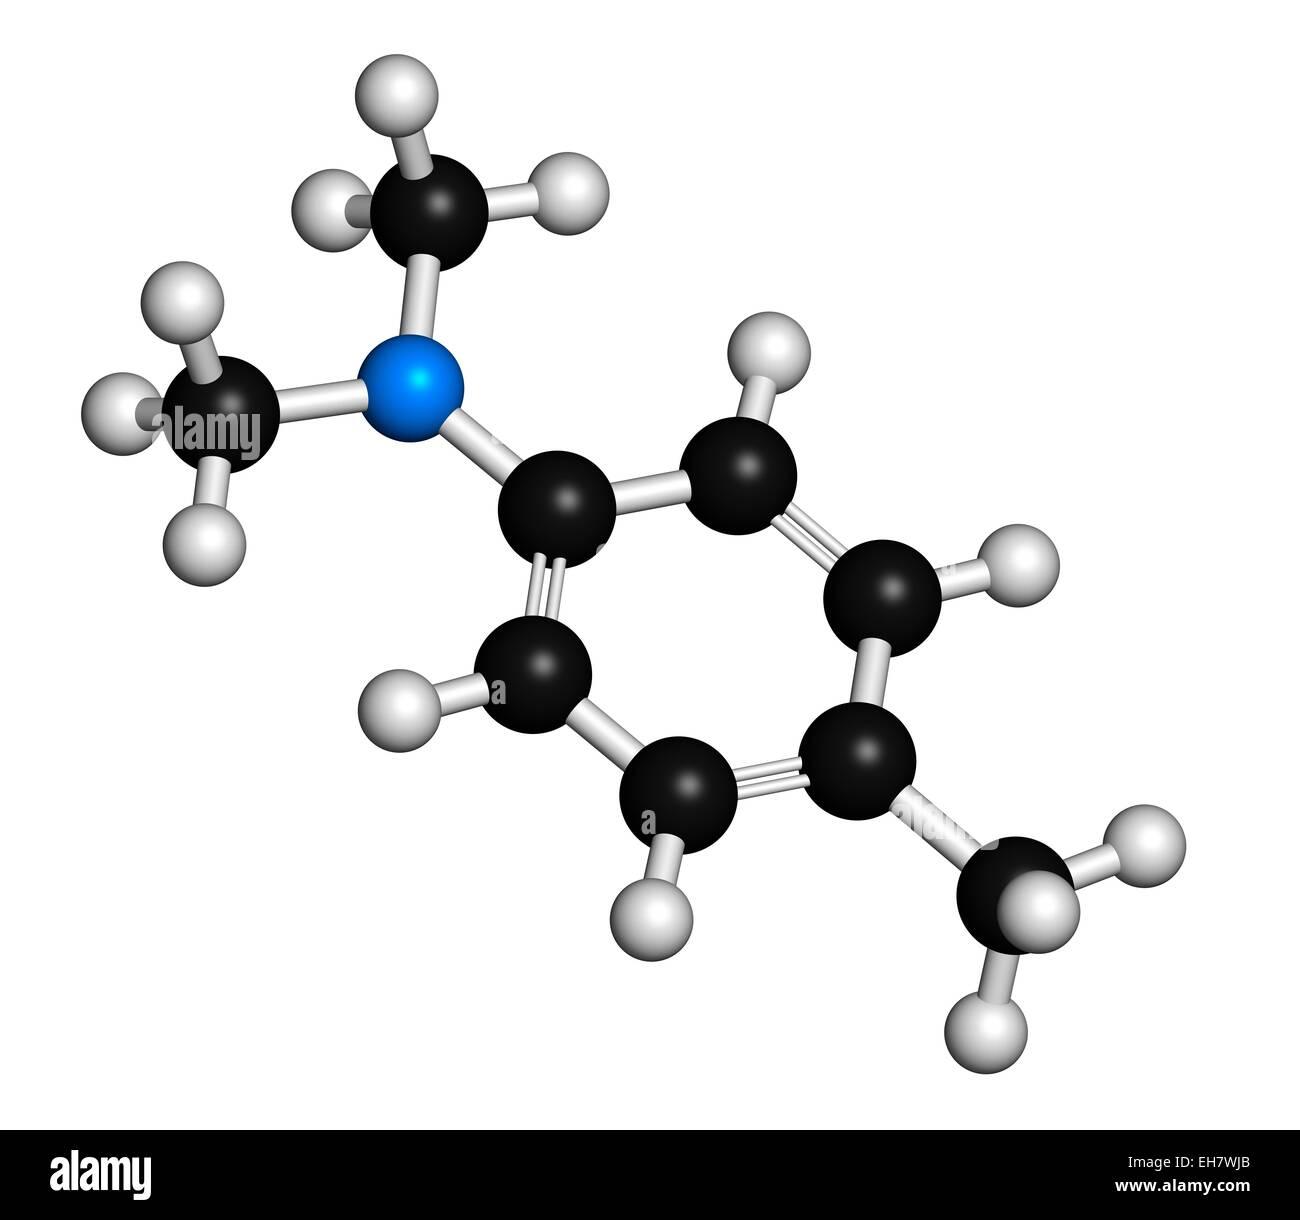 N,N-dimethyl-p-toluidine (DMPT) molecule - Stock Image